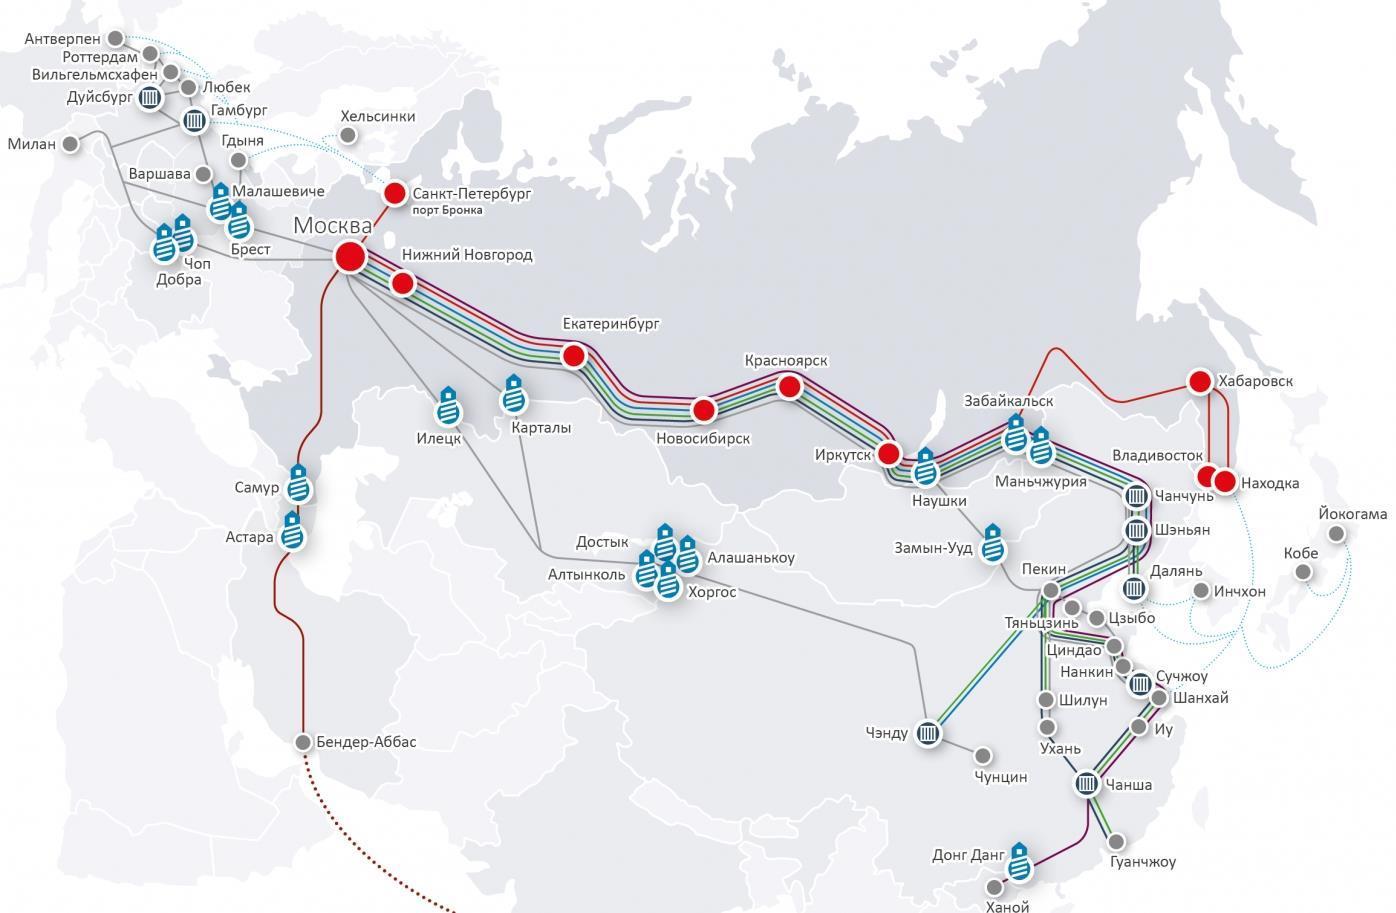 Russia's slice of the Silk Road | Article | Automotive Logistics